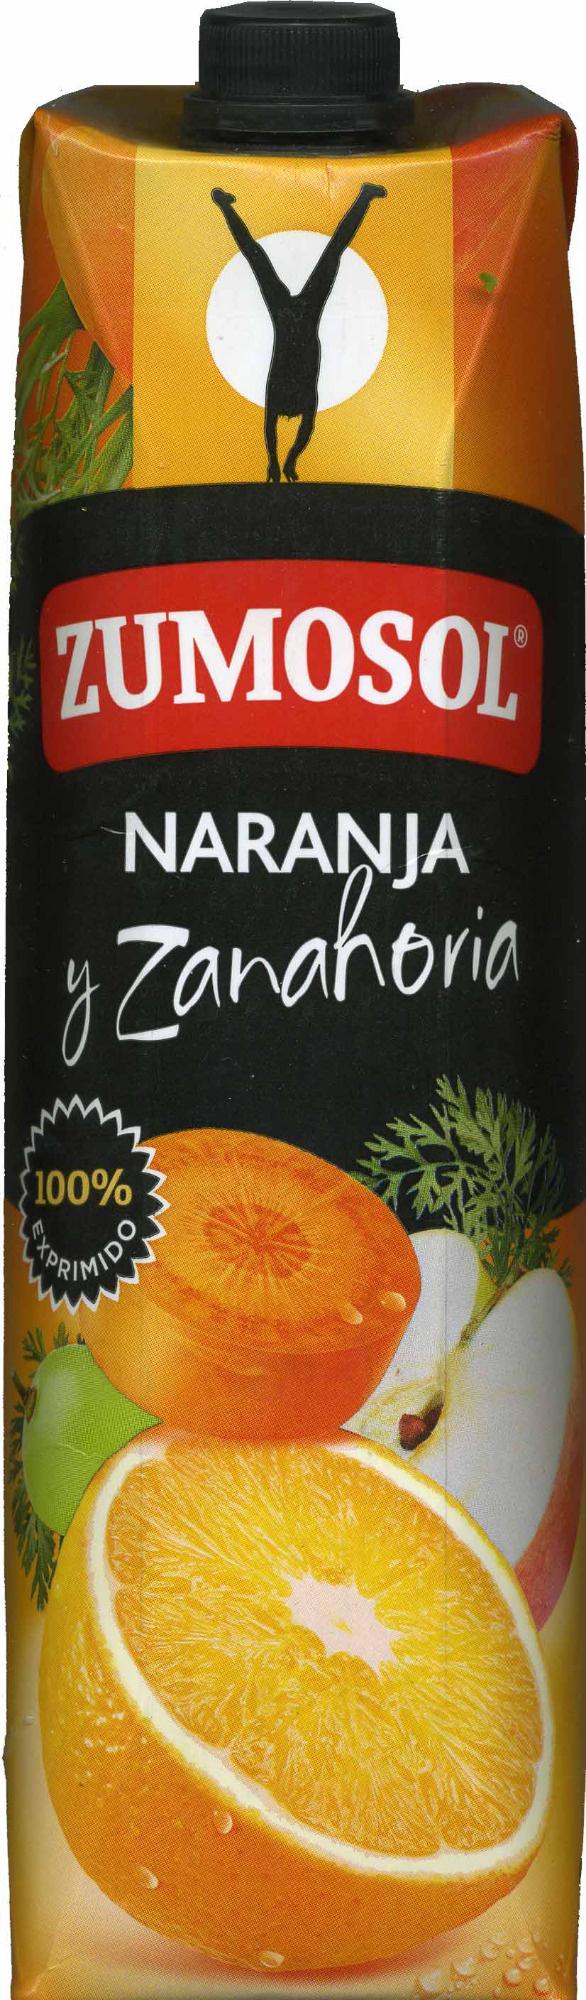 Bebida de zumo de naranja,zanahoria,manzana y - Producte